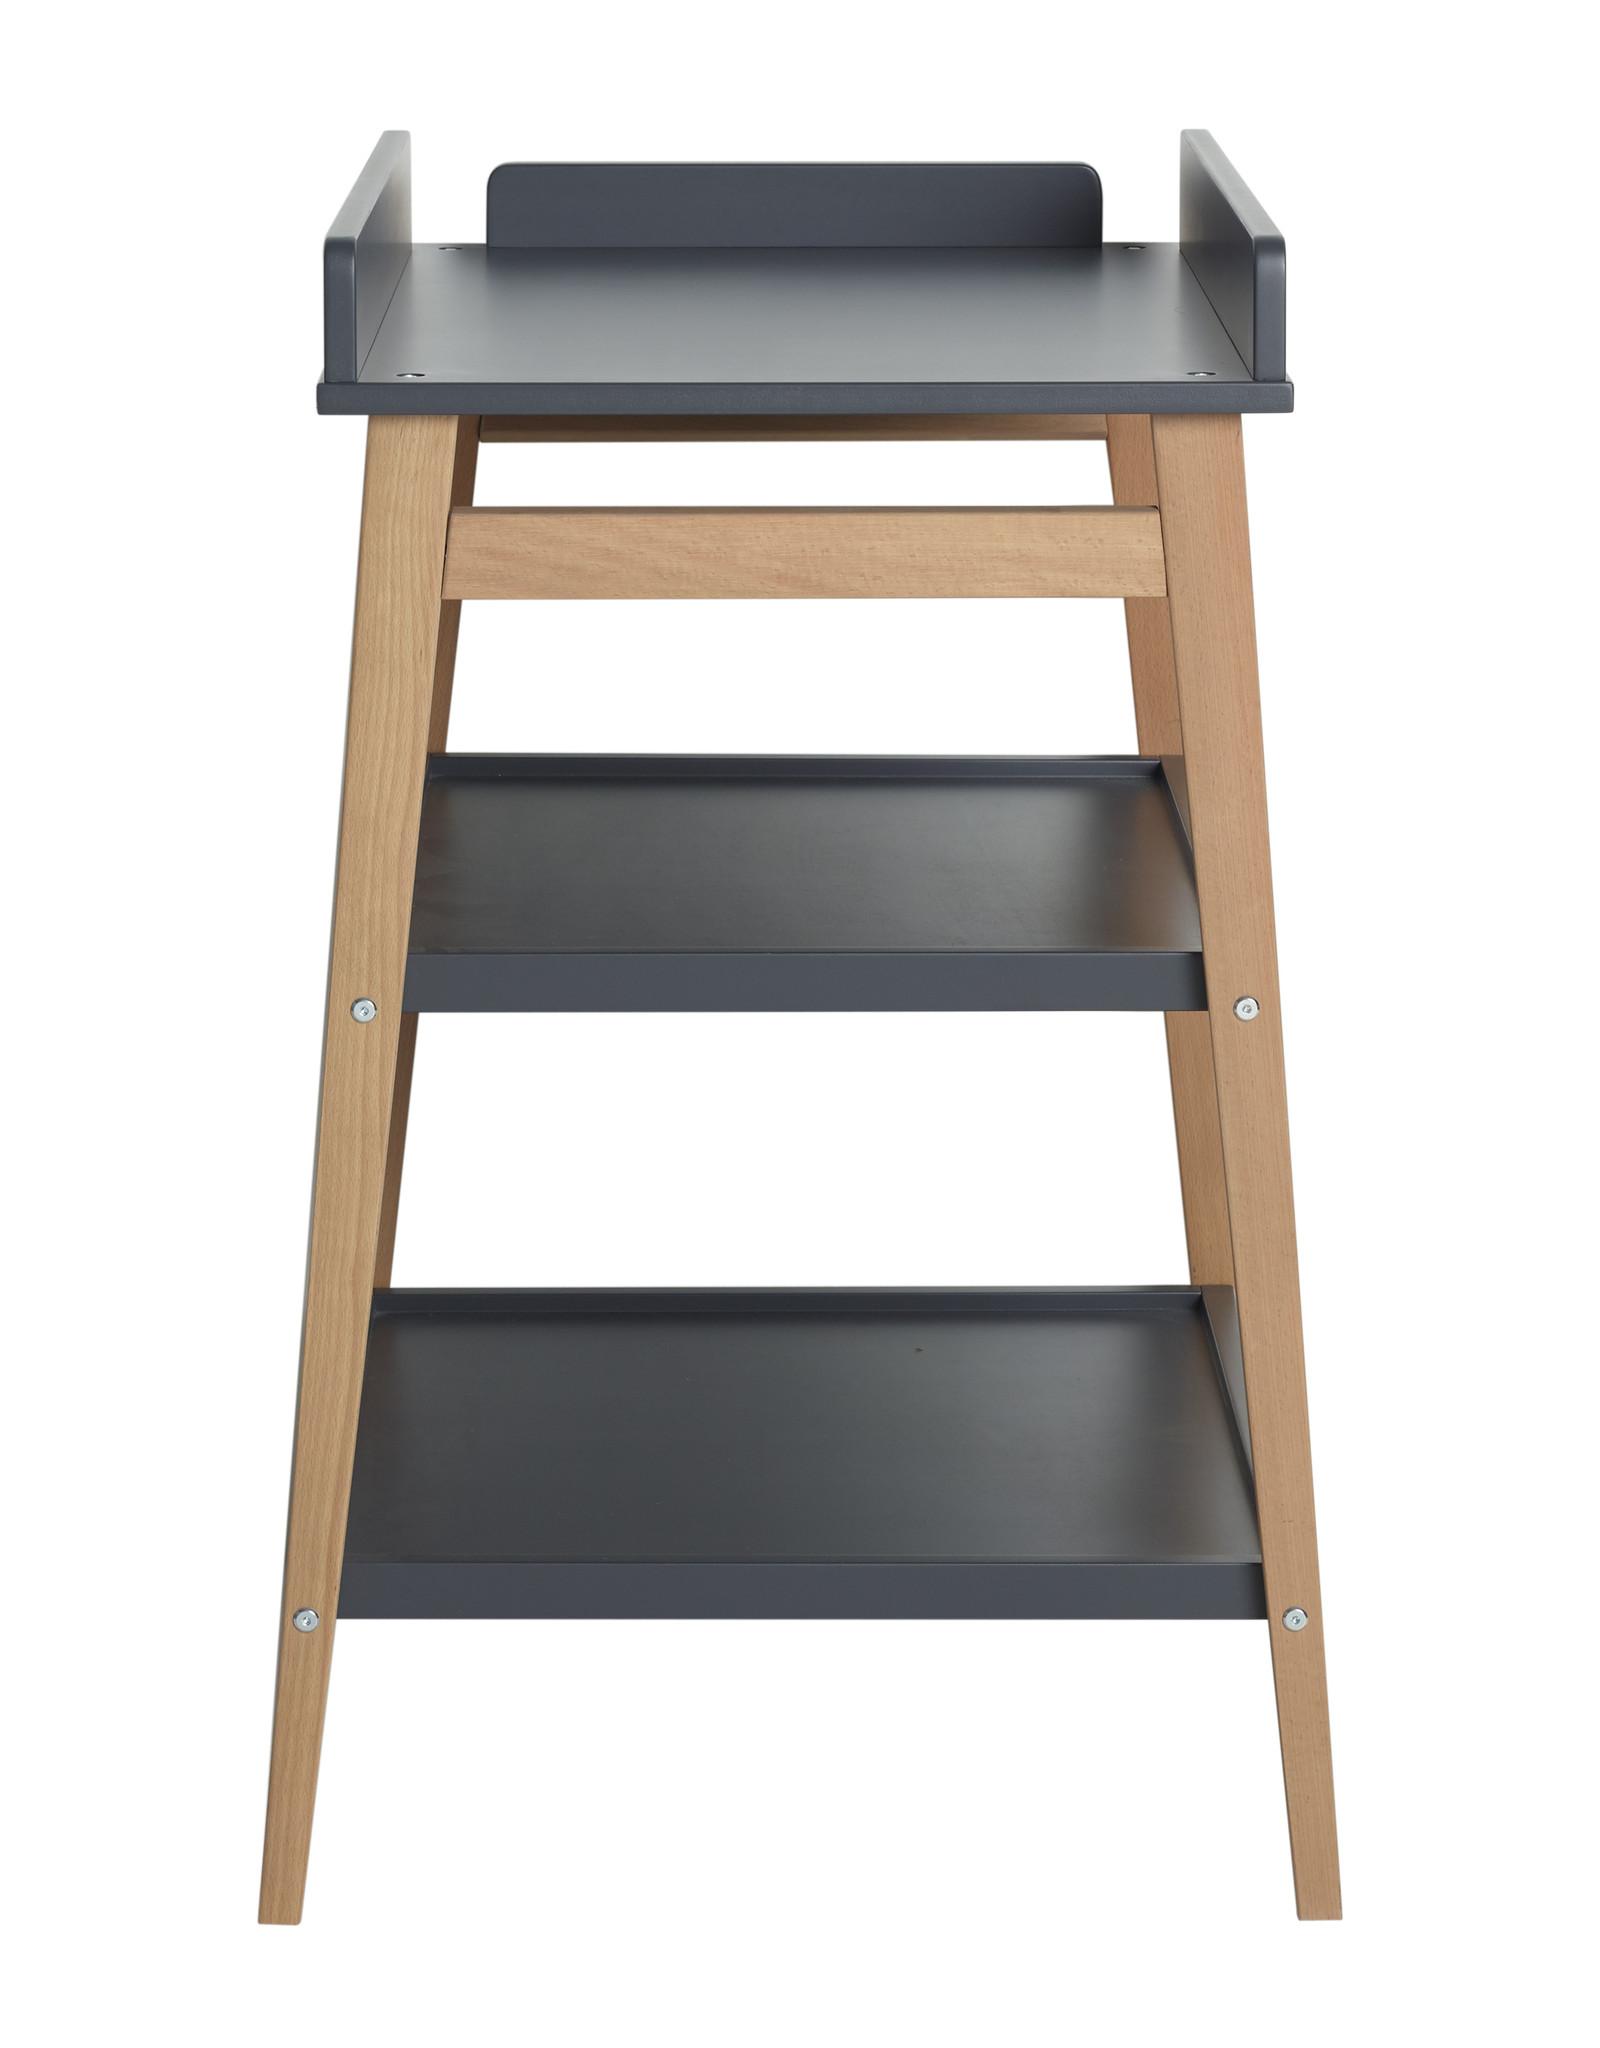 Quax Changing Table - Hip - Moonshadow/naturel